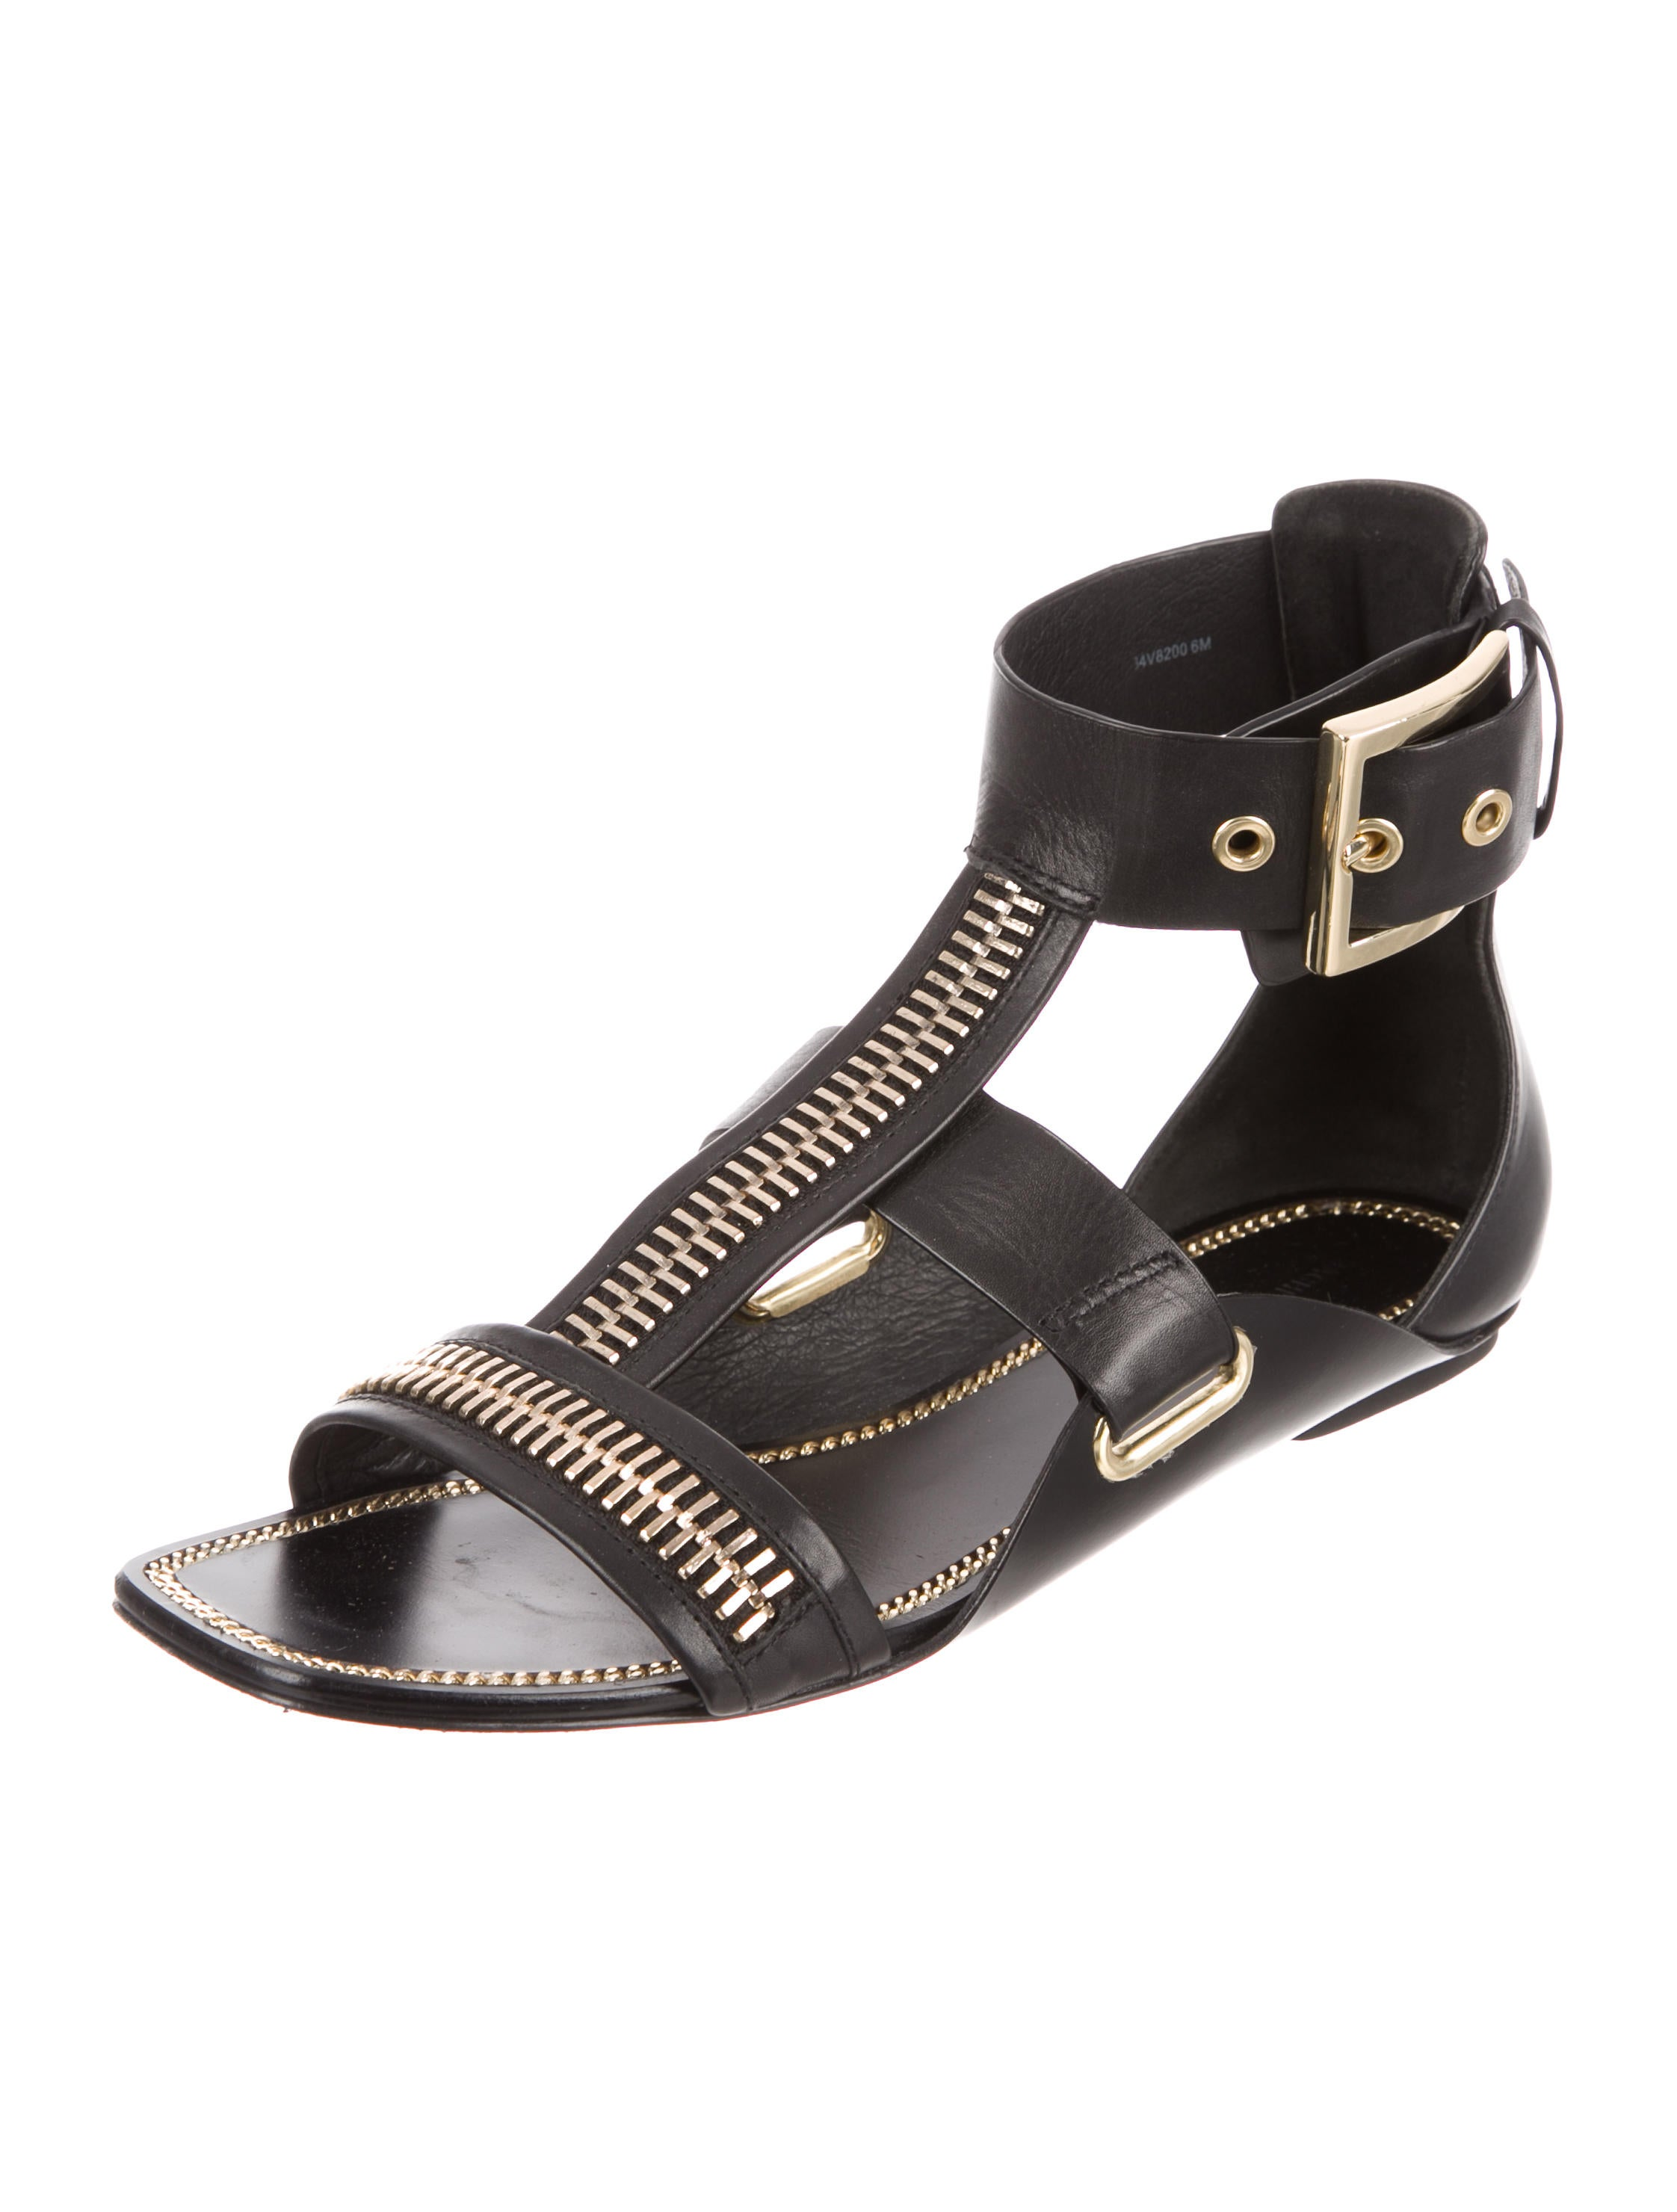 Rachel Zoe Inigo Leather Sandals visit new for sale rTZpw